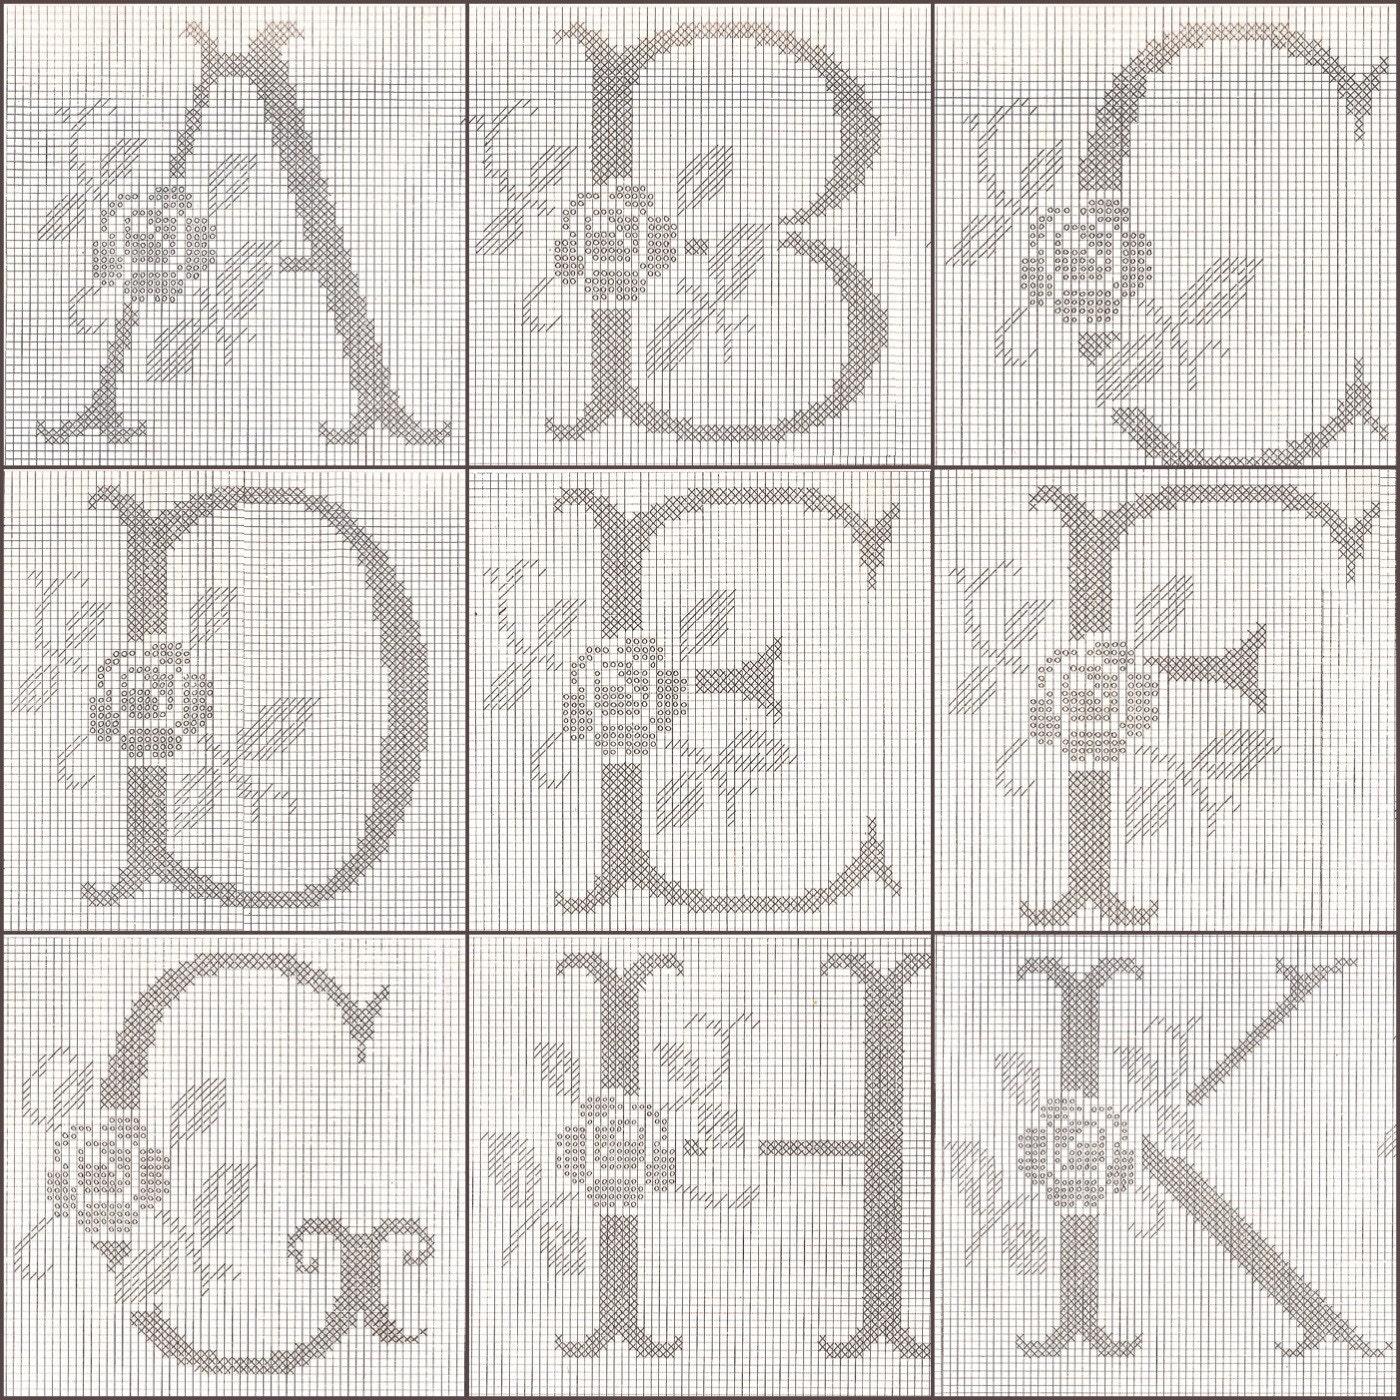 Colorful Alphabet Crochet Pattern Embellishment - Easy Scarf ...